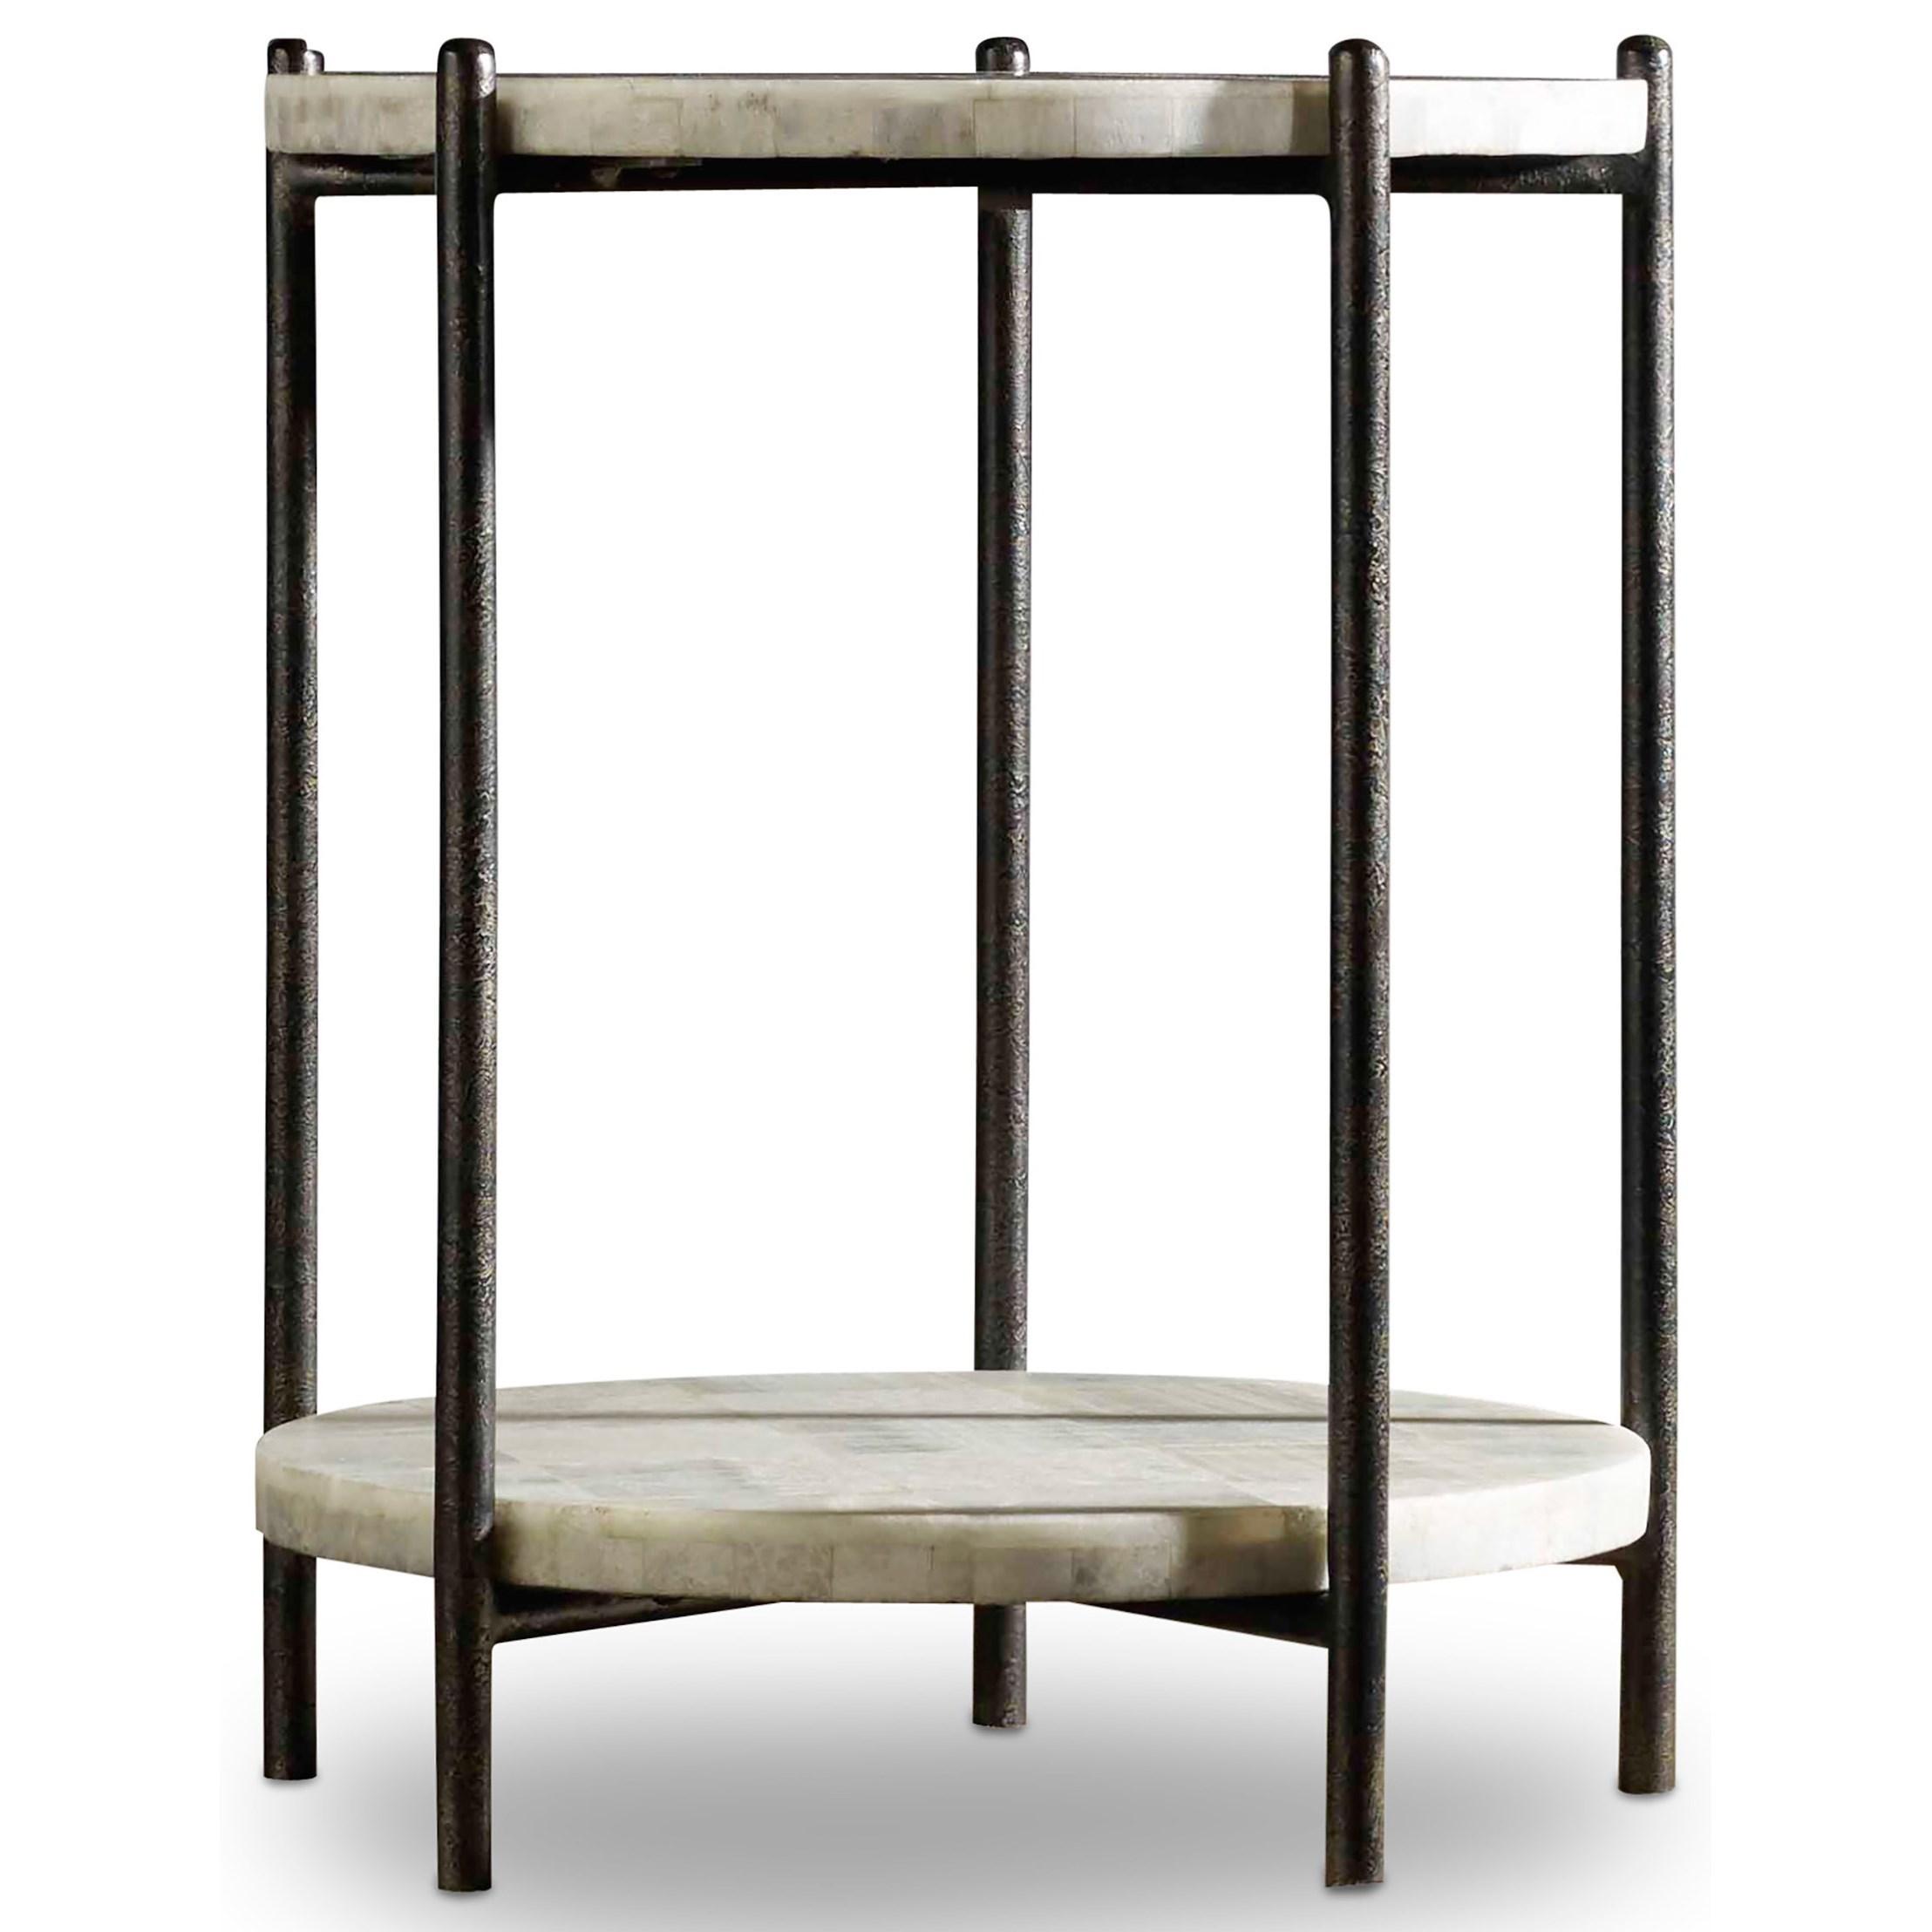 Mélange Blythe Accent Table by Hooker Furniture at Baer's Furniture